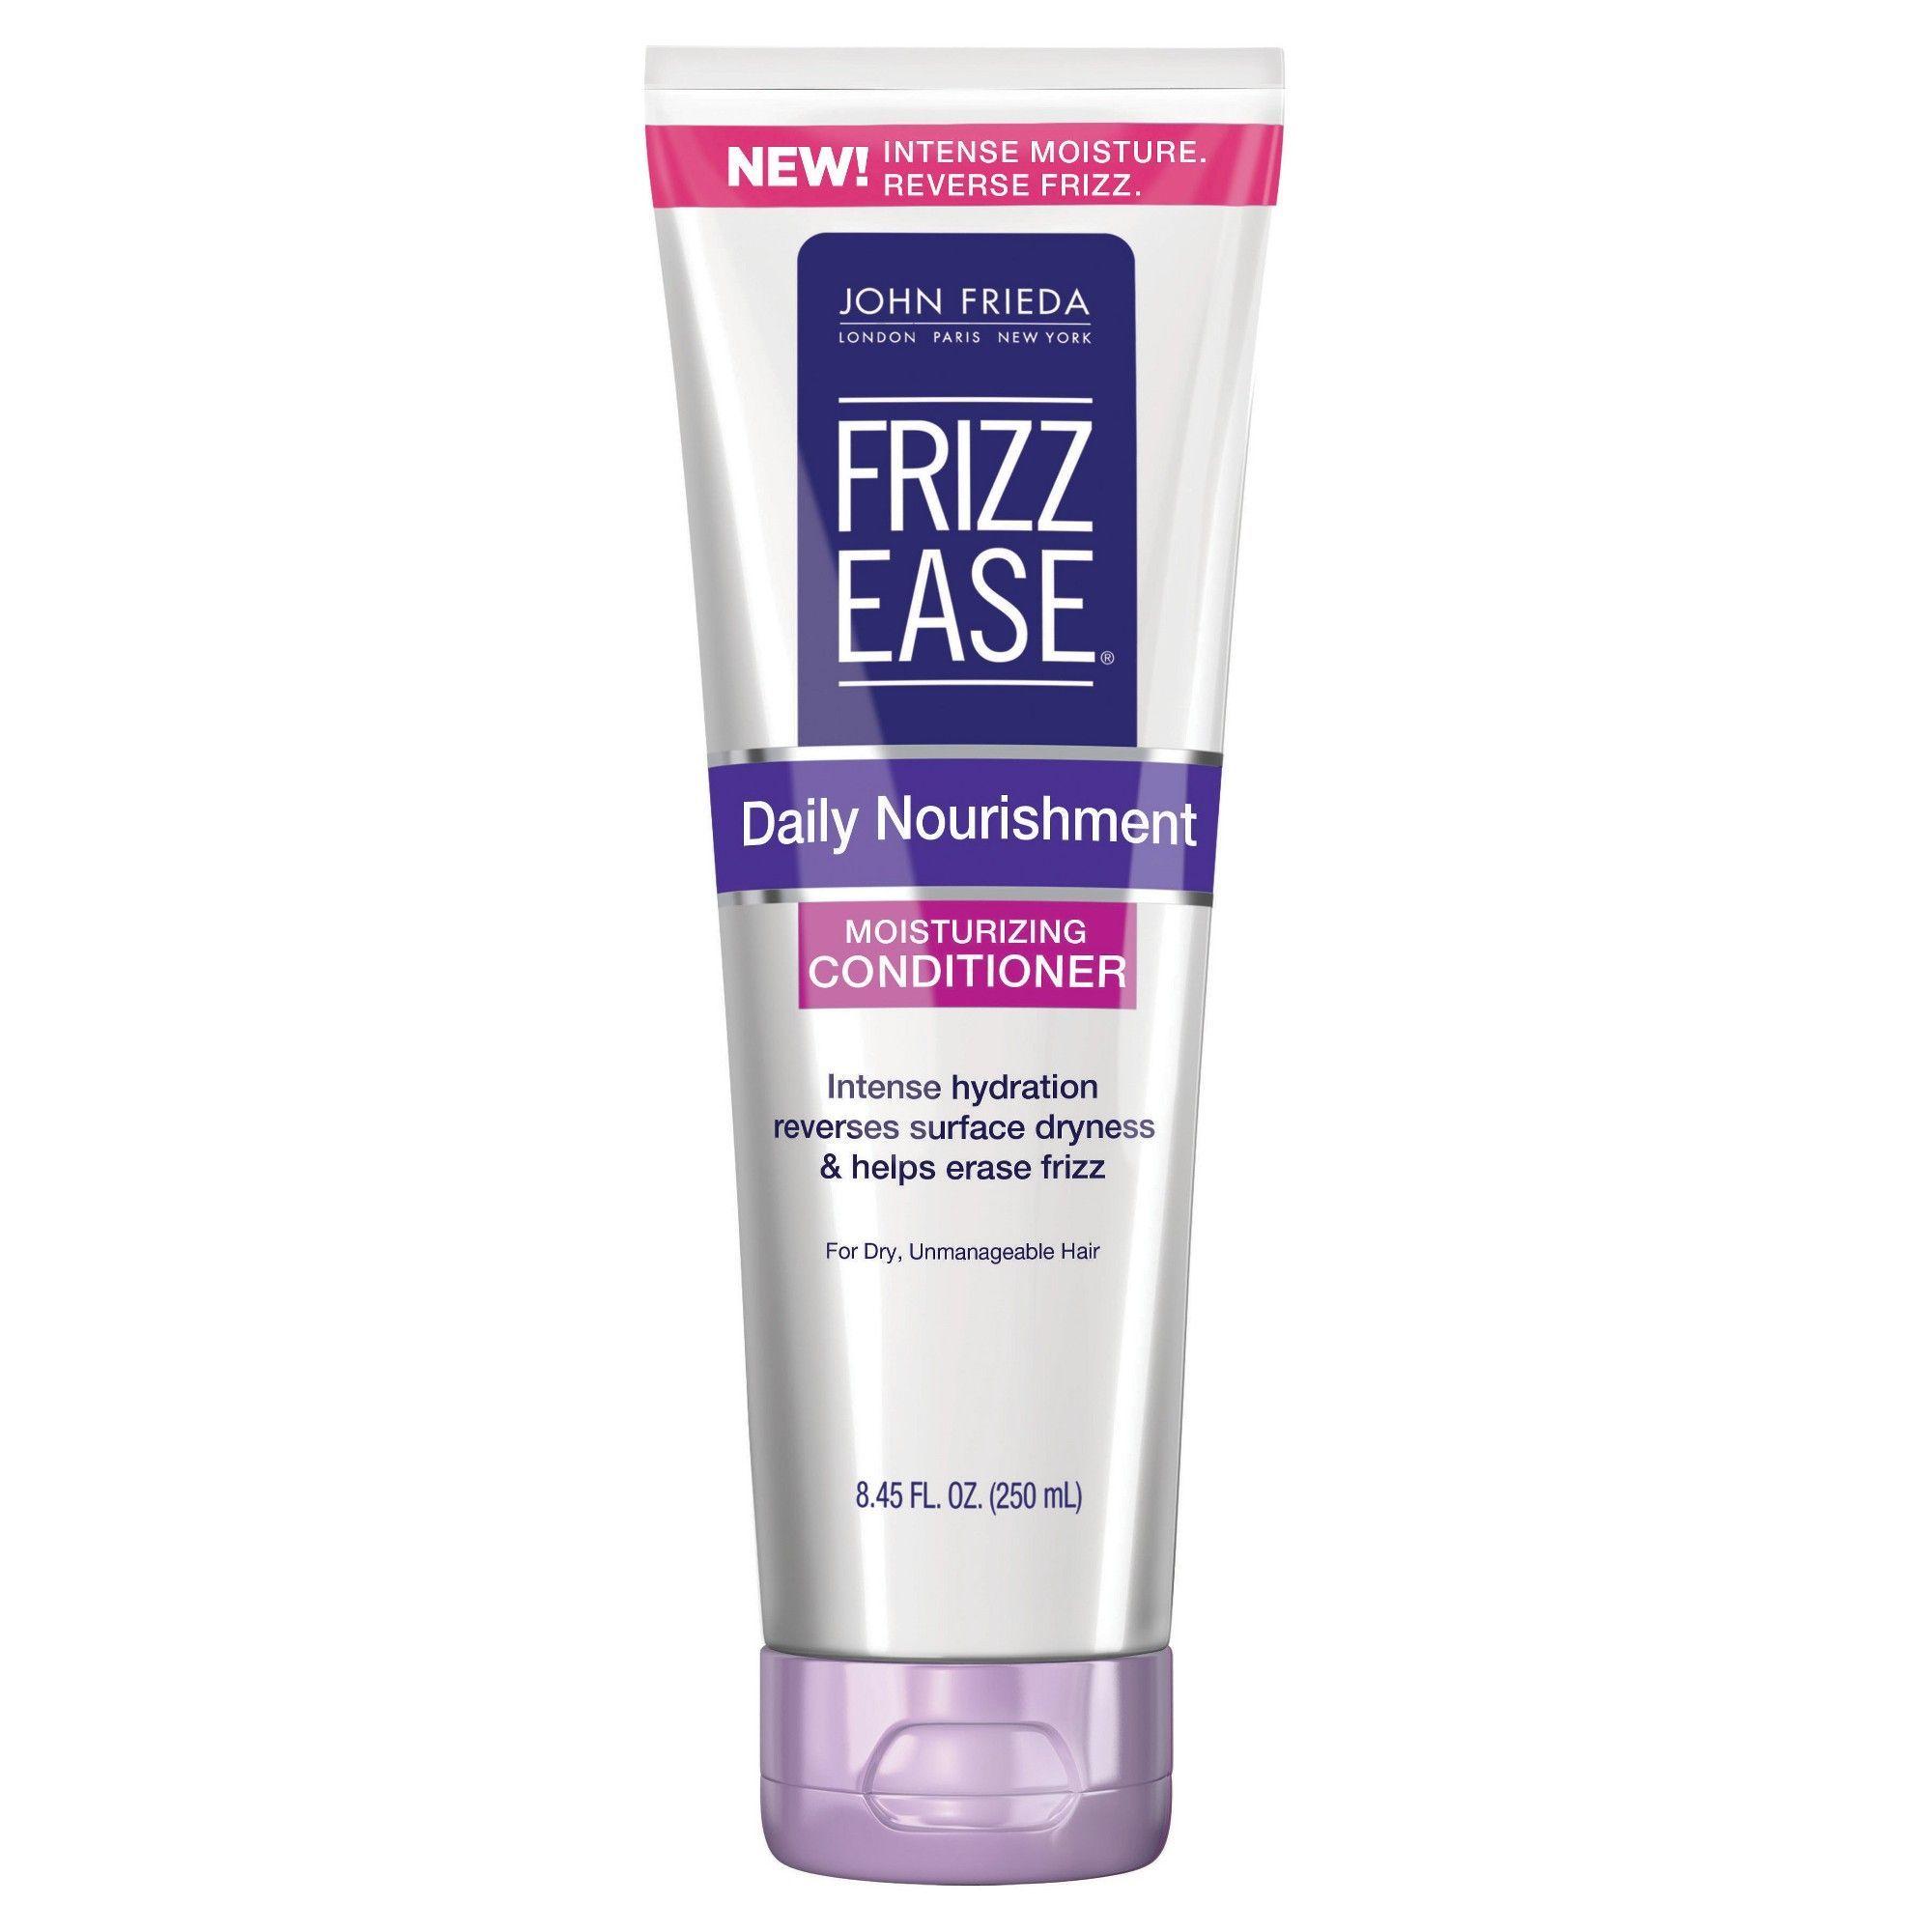 John Frieda Frizz Ease Daily Nourishment Conditioner 8 45oz